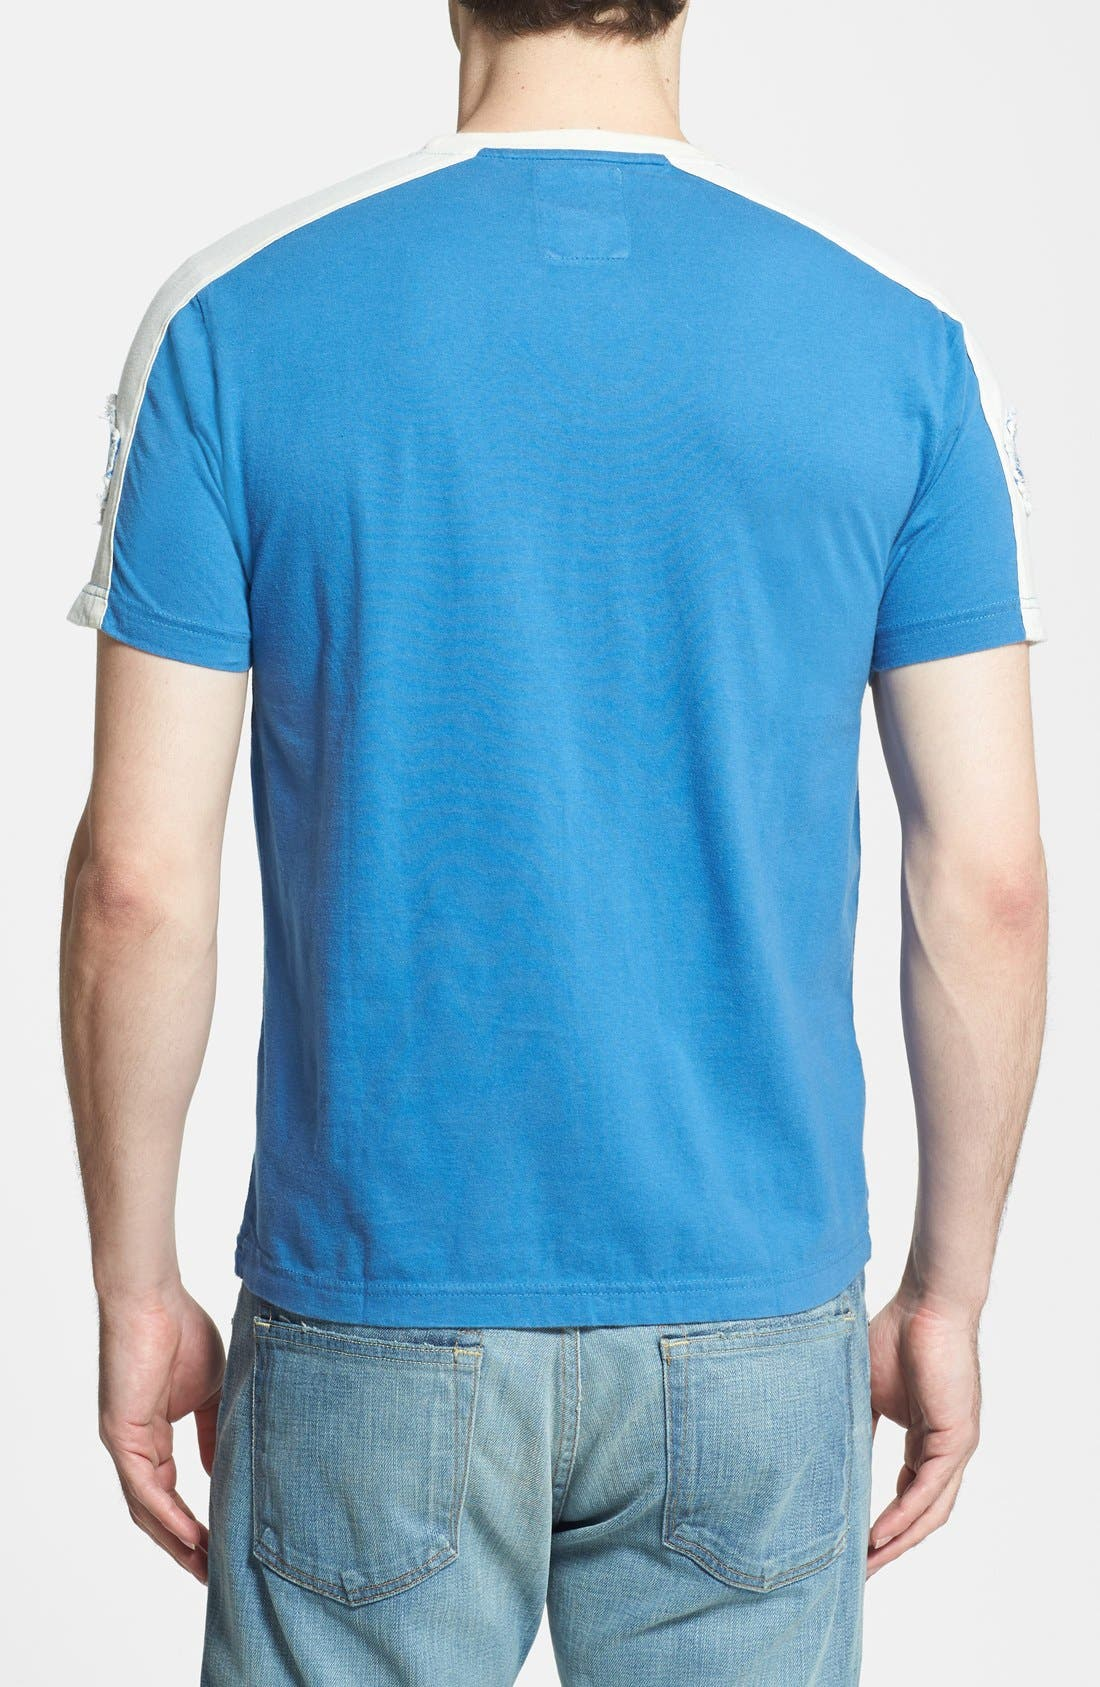 'Toronto Maple Leafs' T-Shirt,                             Alternate thumbnail 2, color,                             450